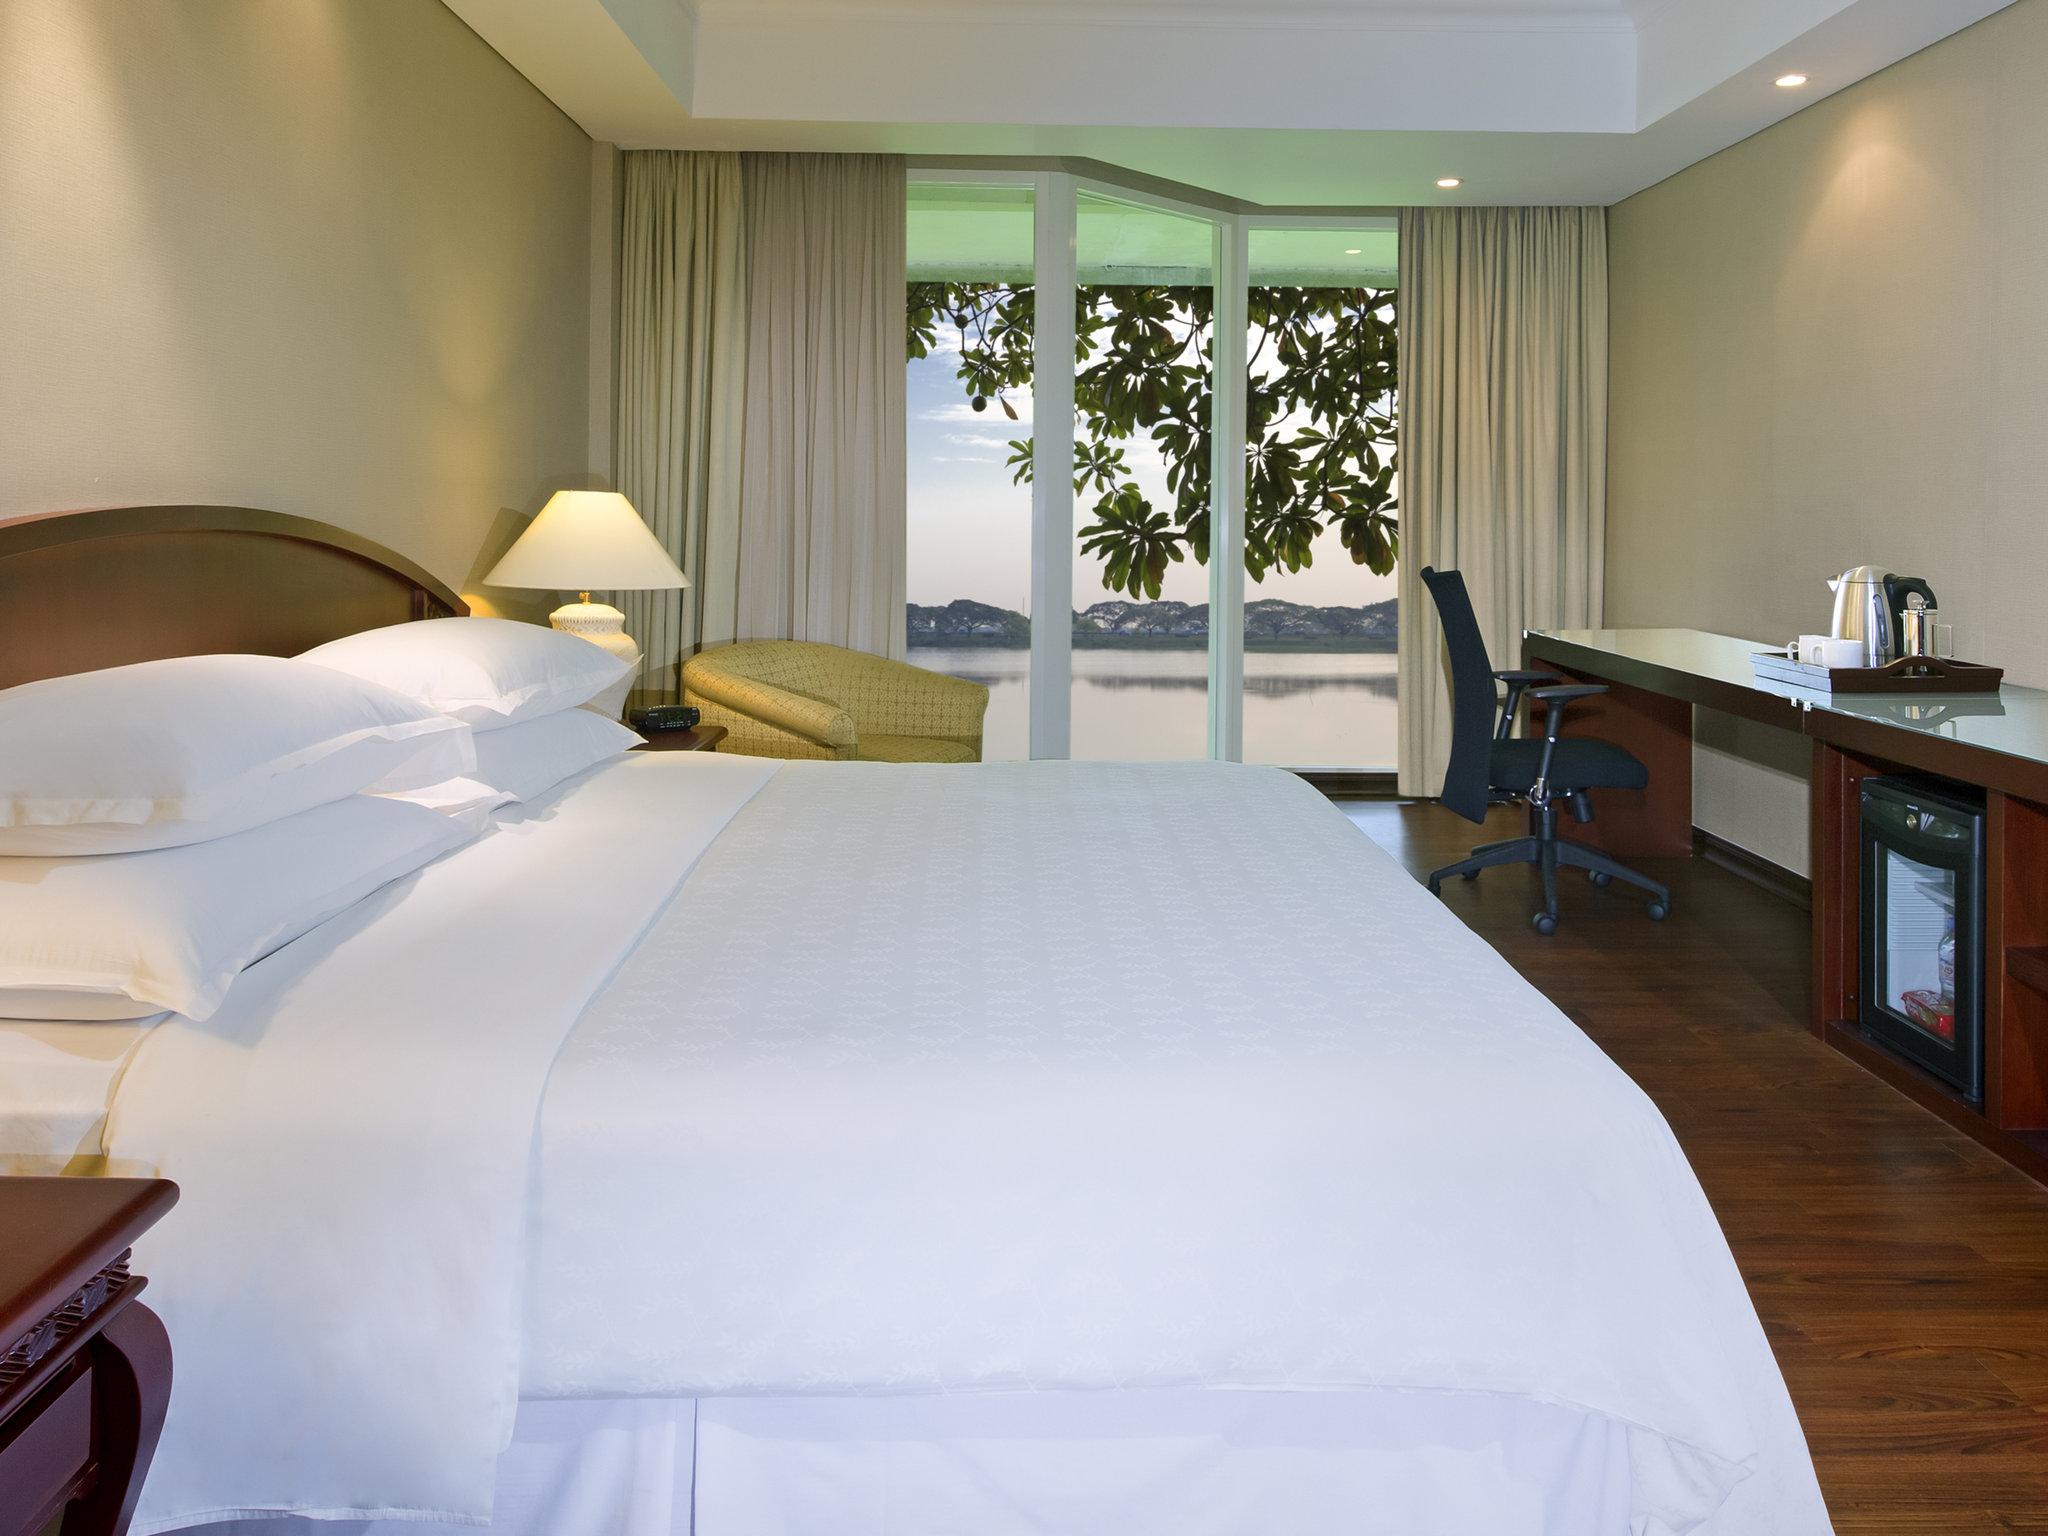 Hotel In Jakarta Bandara International Managed By Accorhotels Cetak Foto Ukuran 24r Salon Rooms